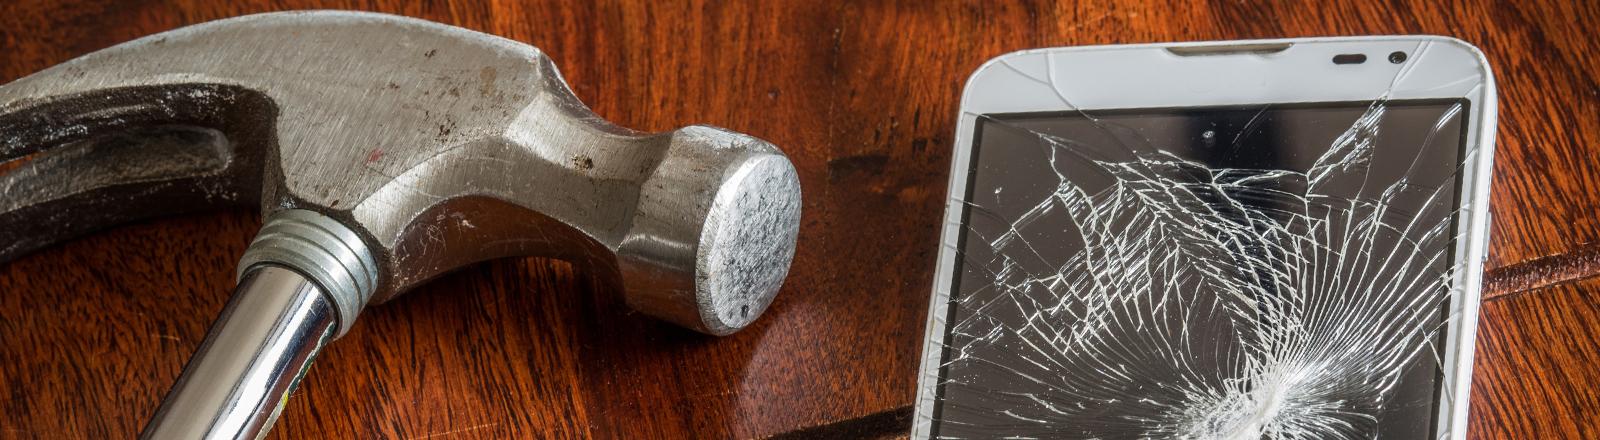 Smartphone mit defektem Display neben Hammer